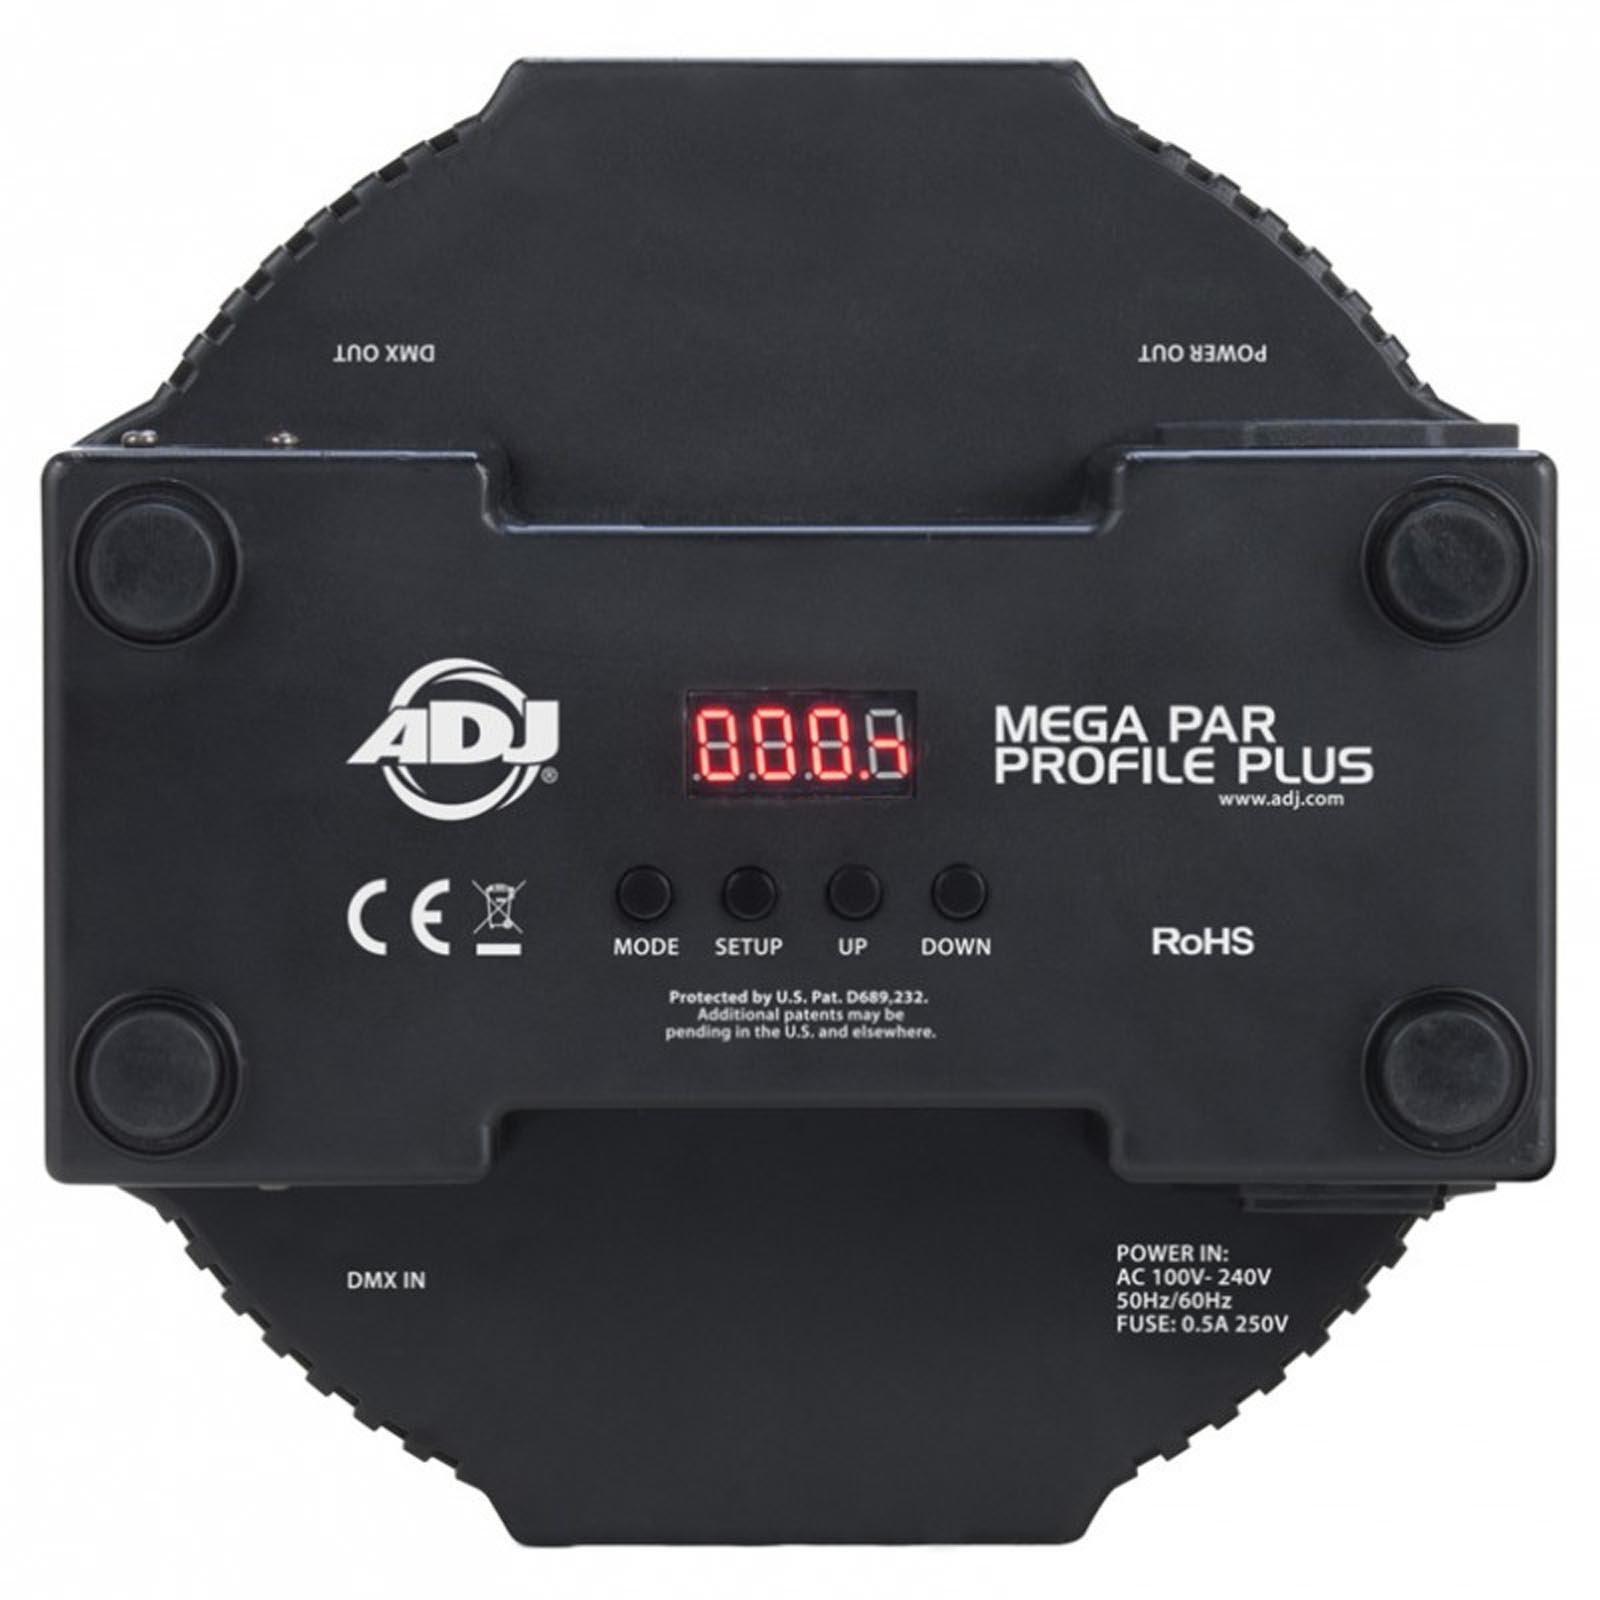 American DJ ADJ Mega Par Profile Plus LED RGB+UV Slim Par Can Wash Effect Light (6 Pack) by ADJ (Image #8)